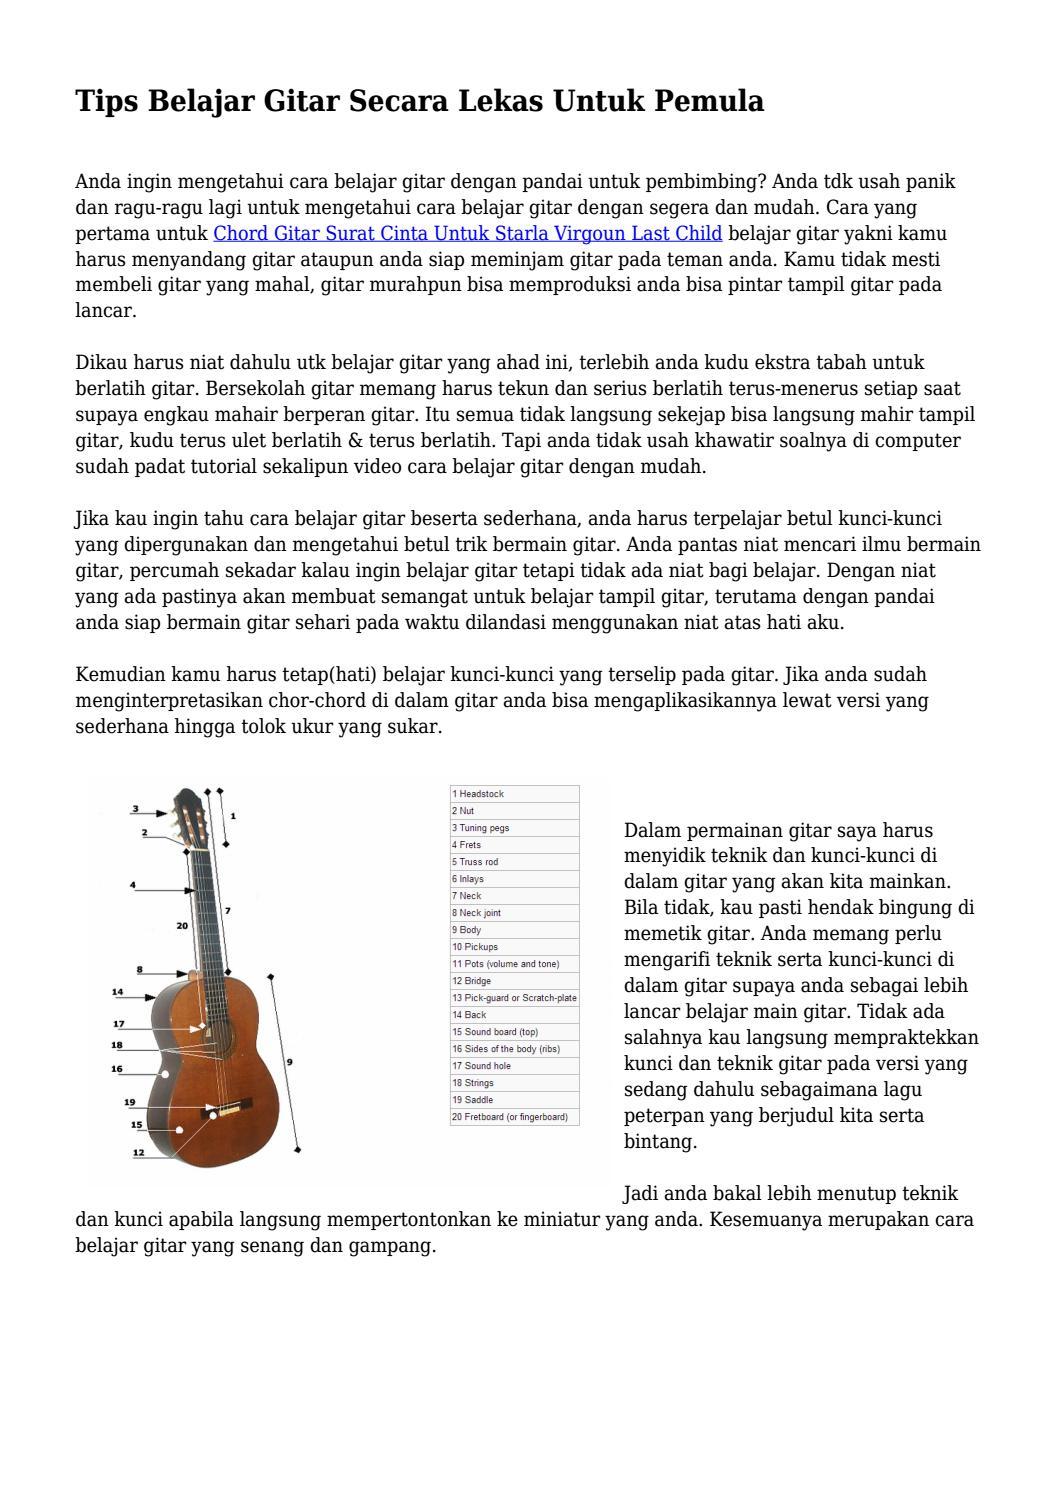 Kunci Gitar Main Hati : kunci, gitar, Kunci, Gitar, Child